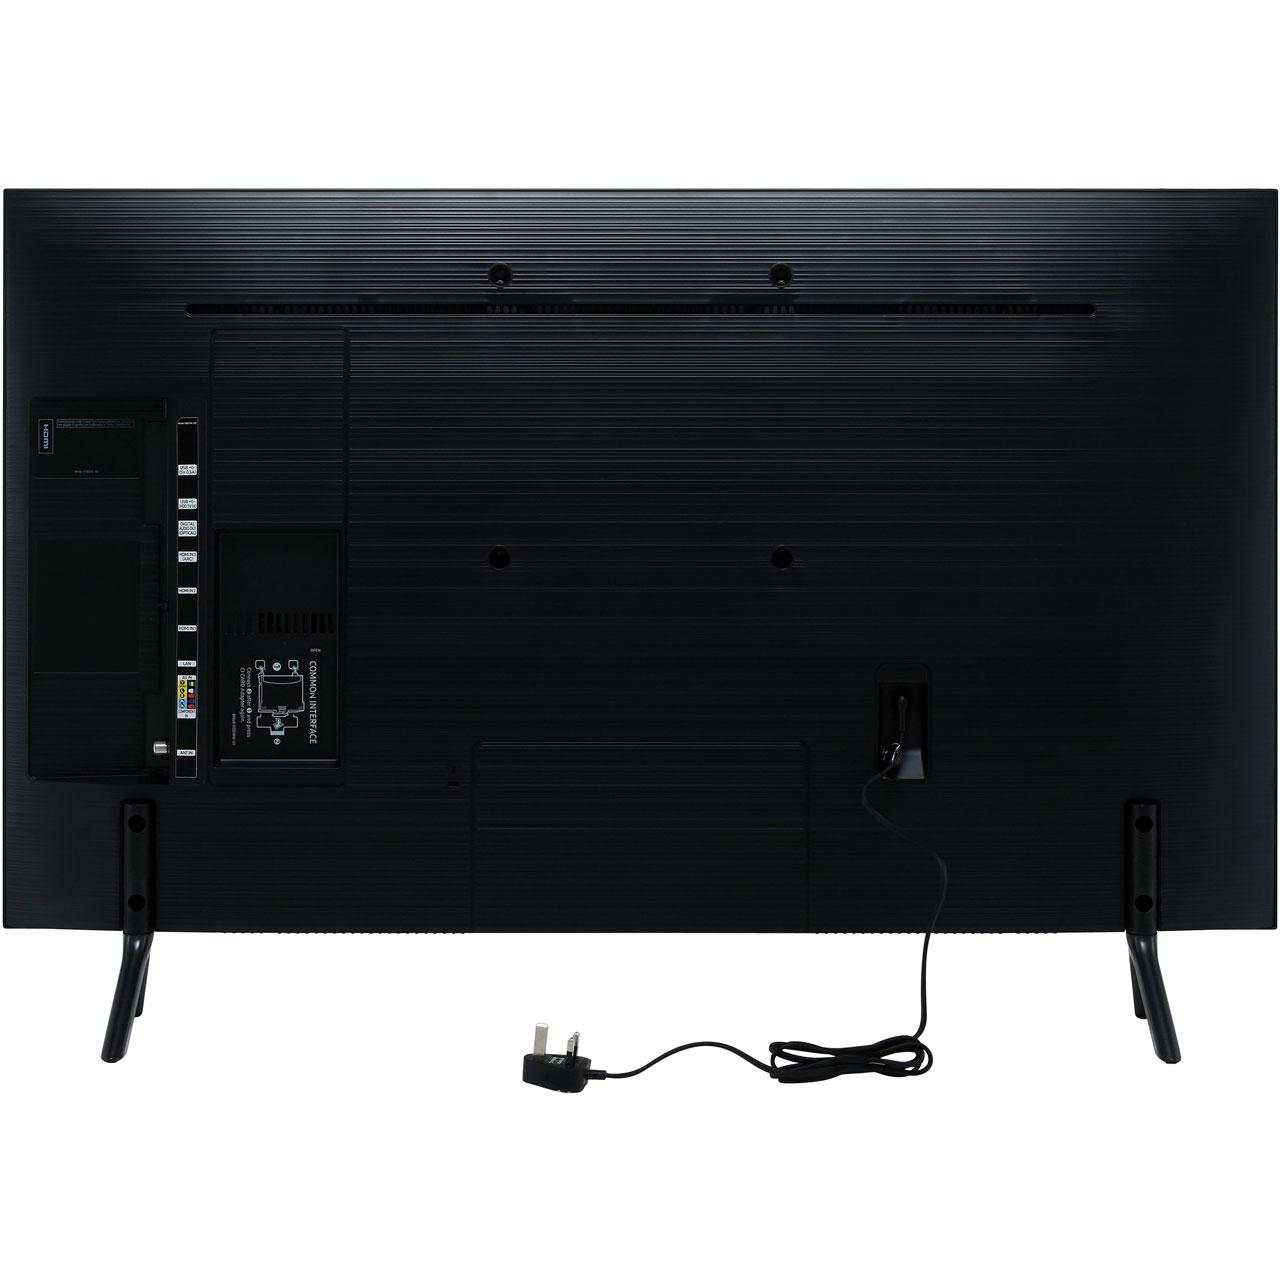 Samsung UE40NU7120 NU7000 40 Inch 4K Ultra HD A Smart LED